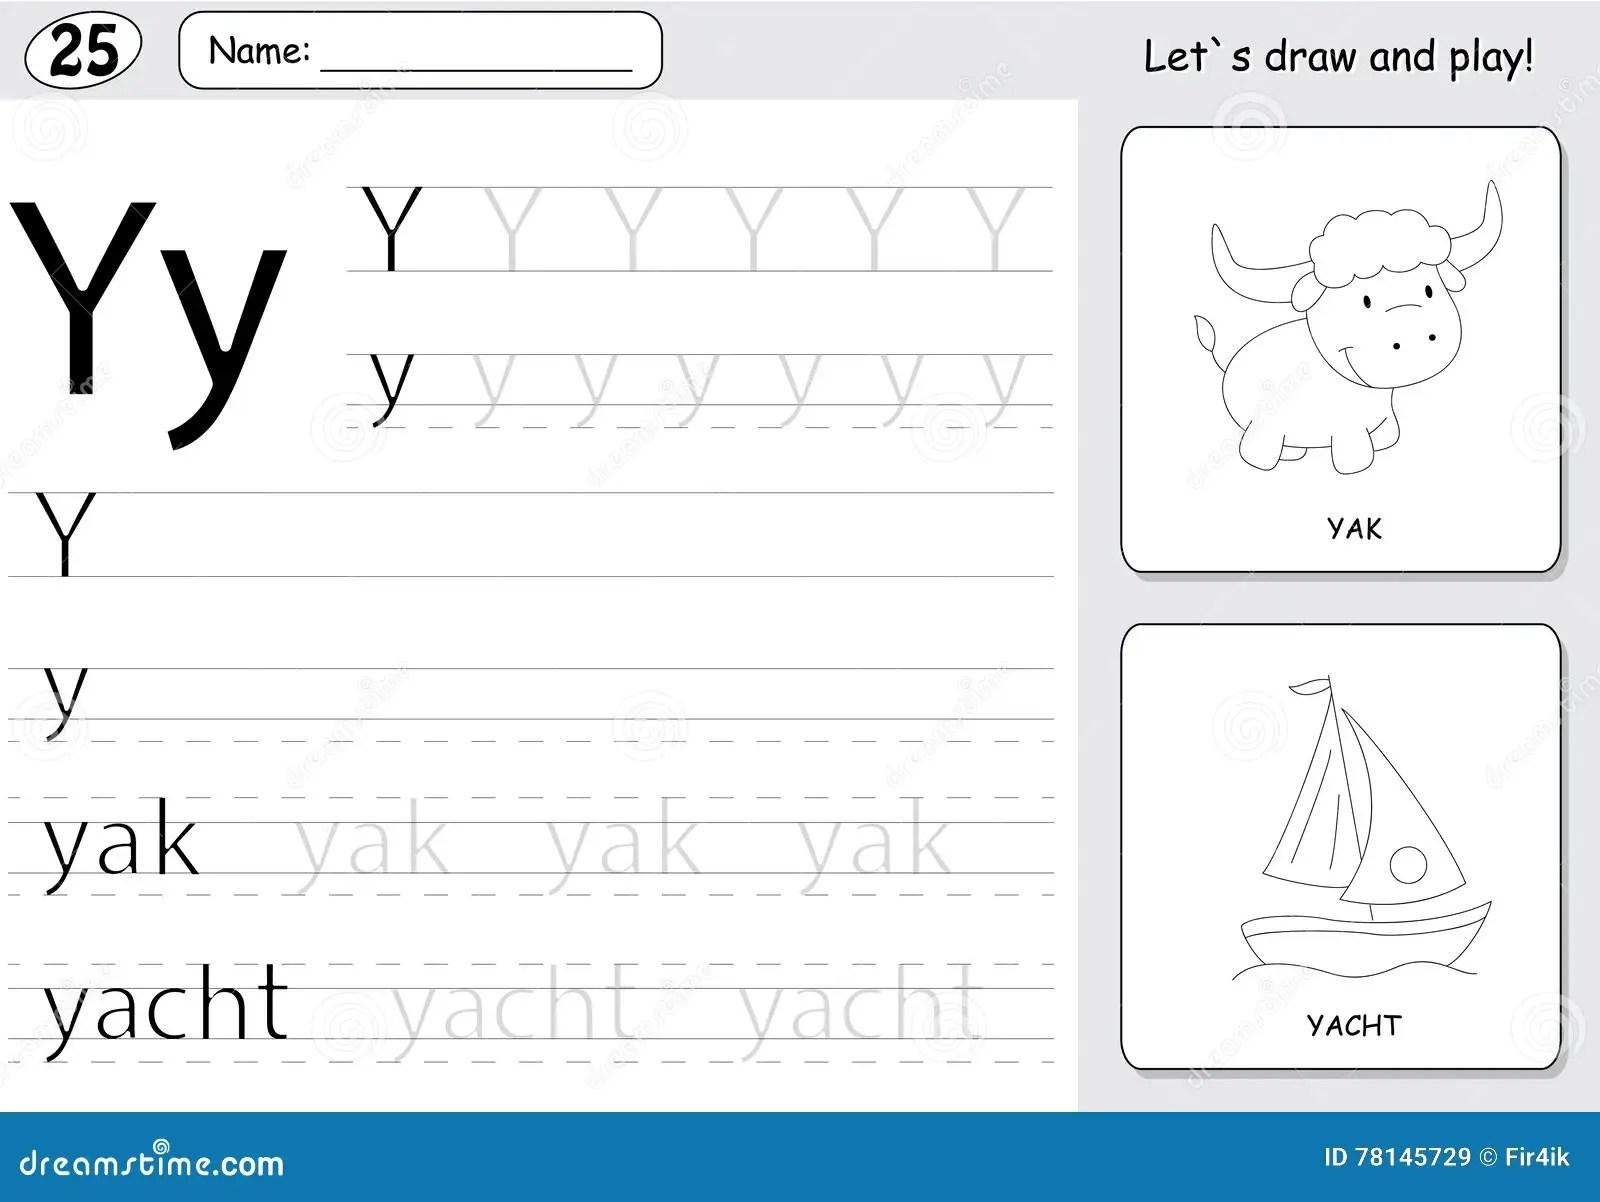 Cartoon Yak And Yacht Alphabet Tracing Worksheet Writing